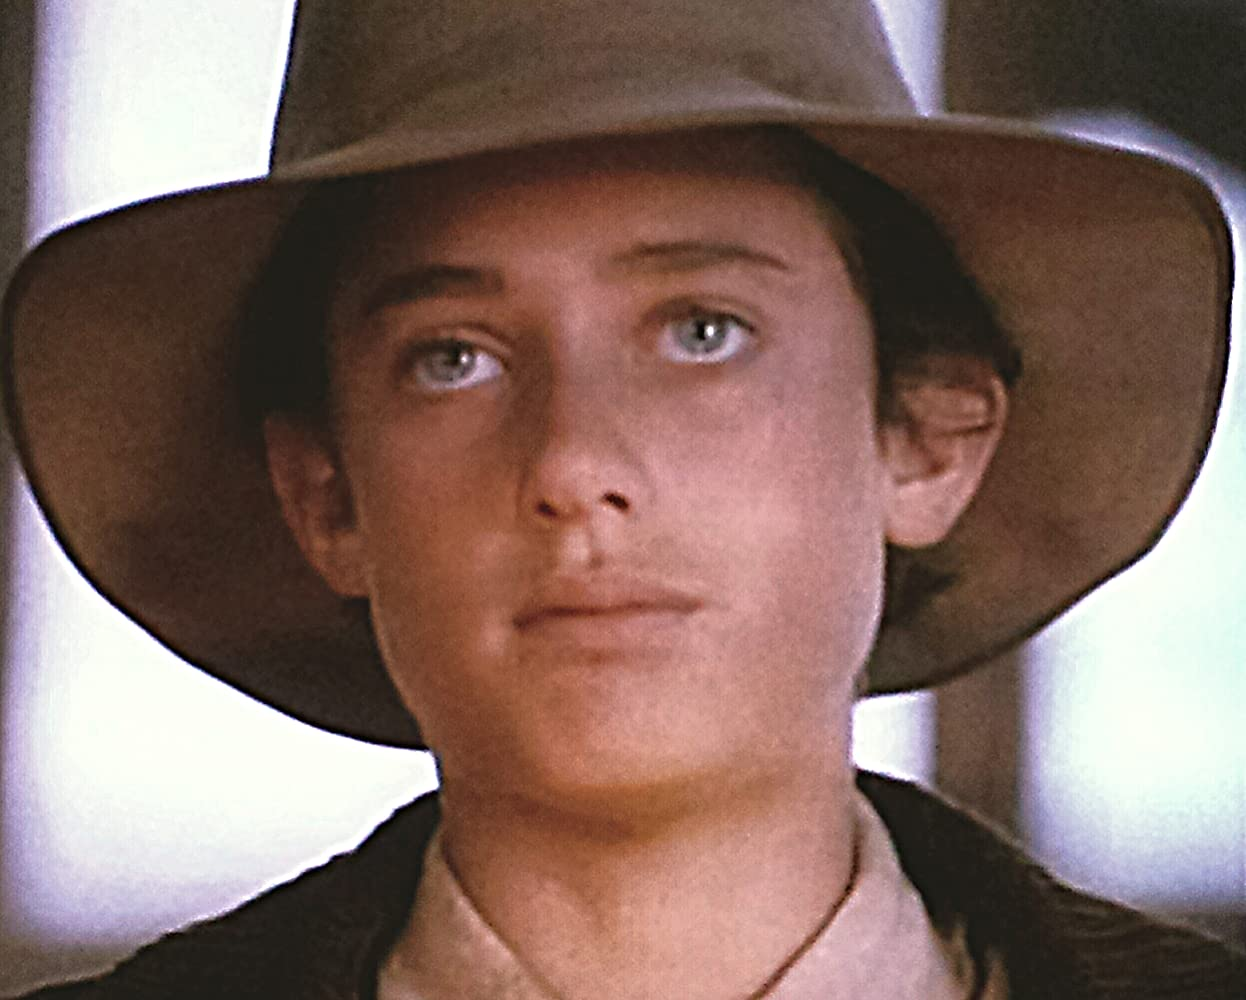 Rosemarie Sonora (b. 1948),Elizabeth Hendrickson born July 3, 1979 (age 39) Adult movies Ross Hull,Micaela Ramazzotti